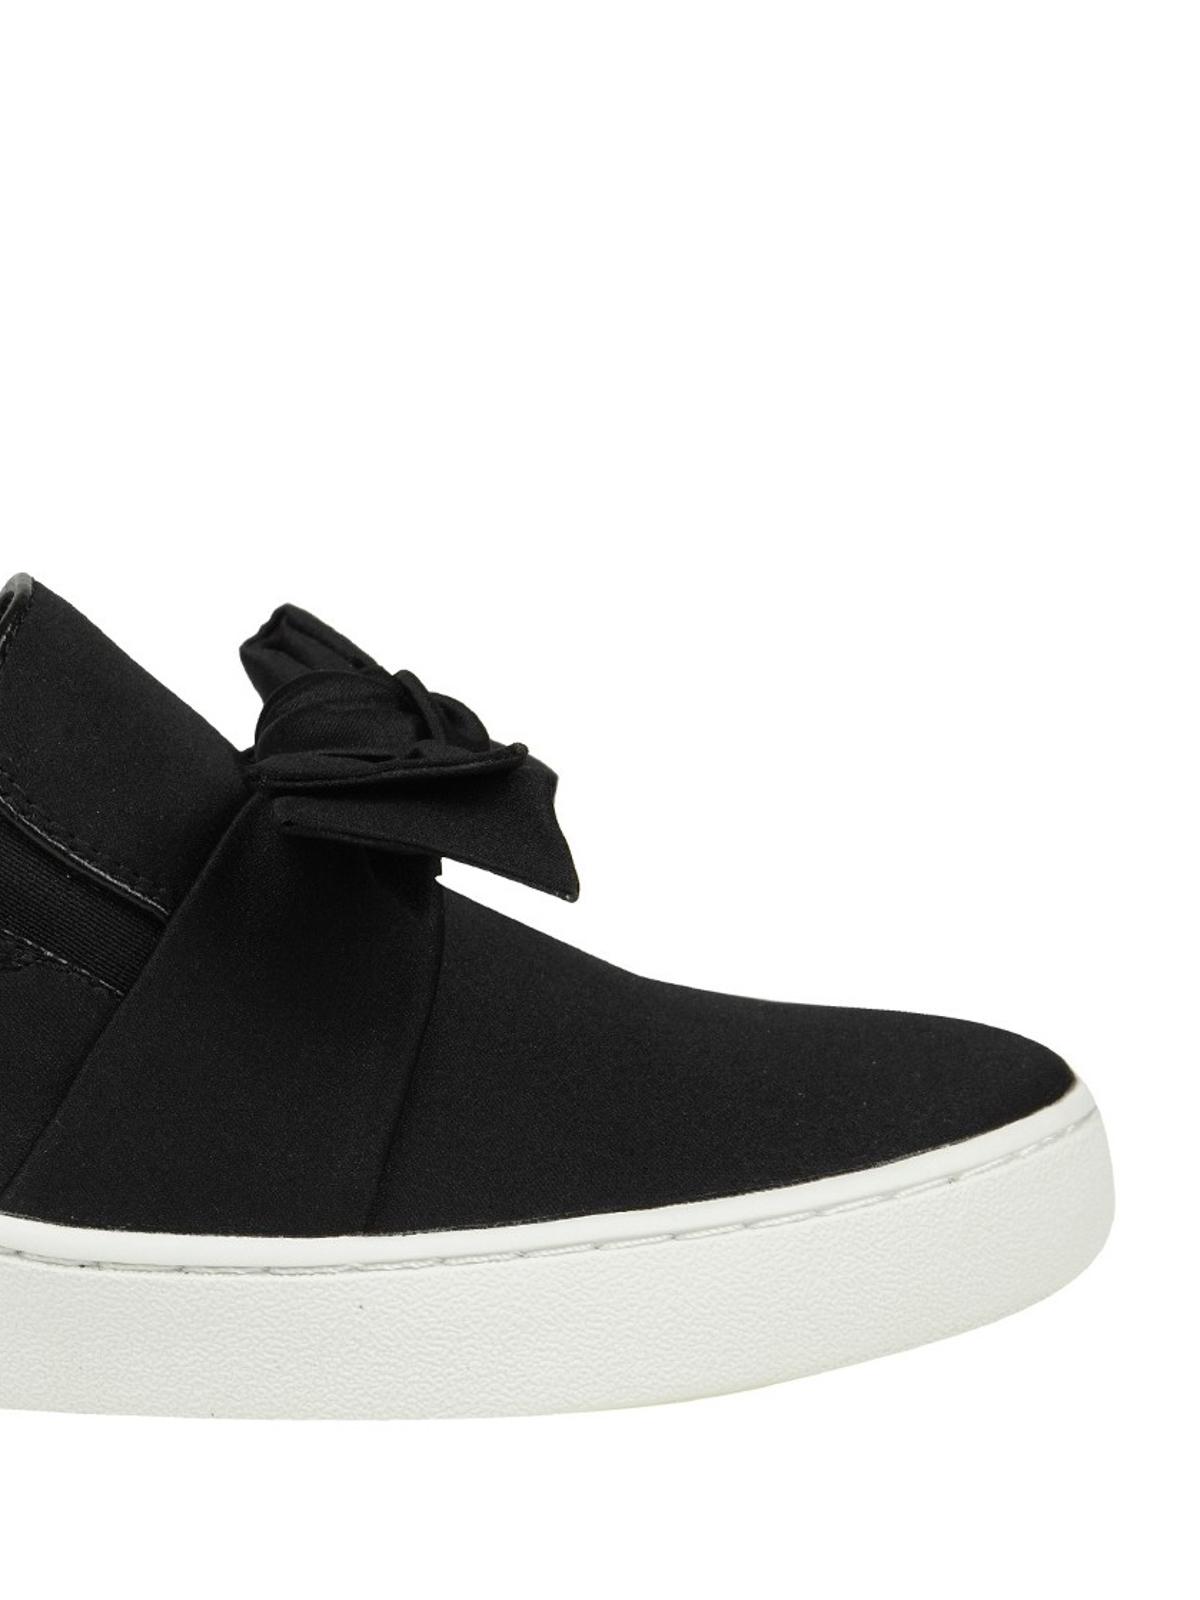 Michael Kors Sneaker Schwarz Sneaker 43R8WIFP1D 001